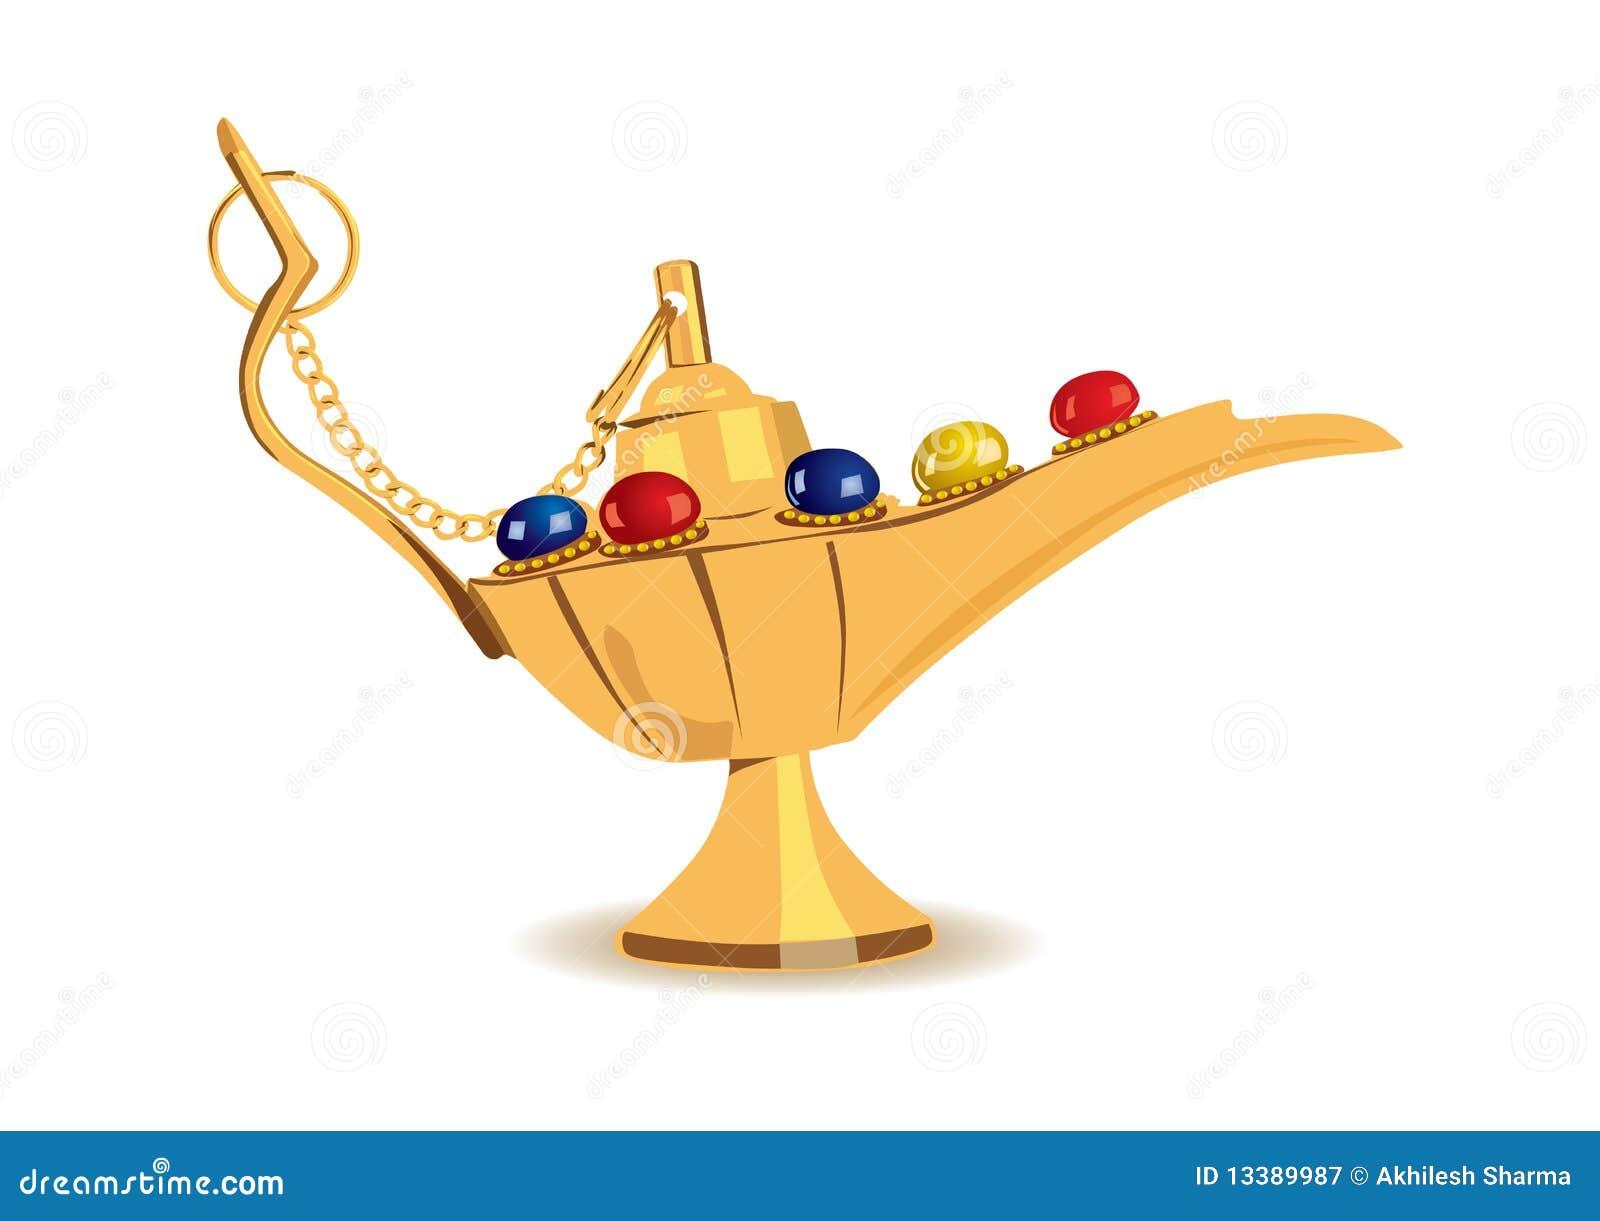 Vector Illustration Of Aladdin's Magic Lamp Royalty Free ...